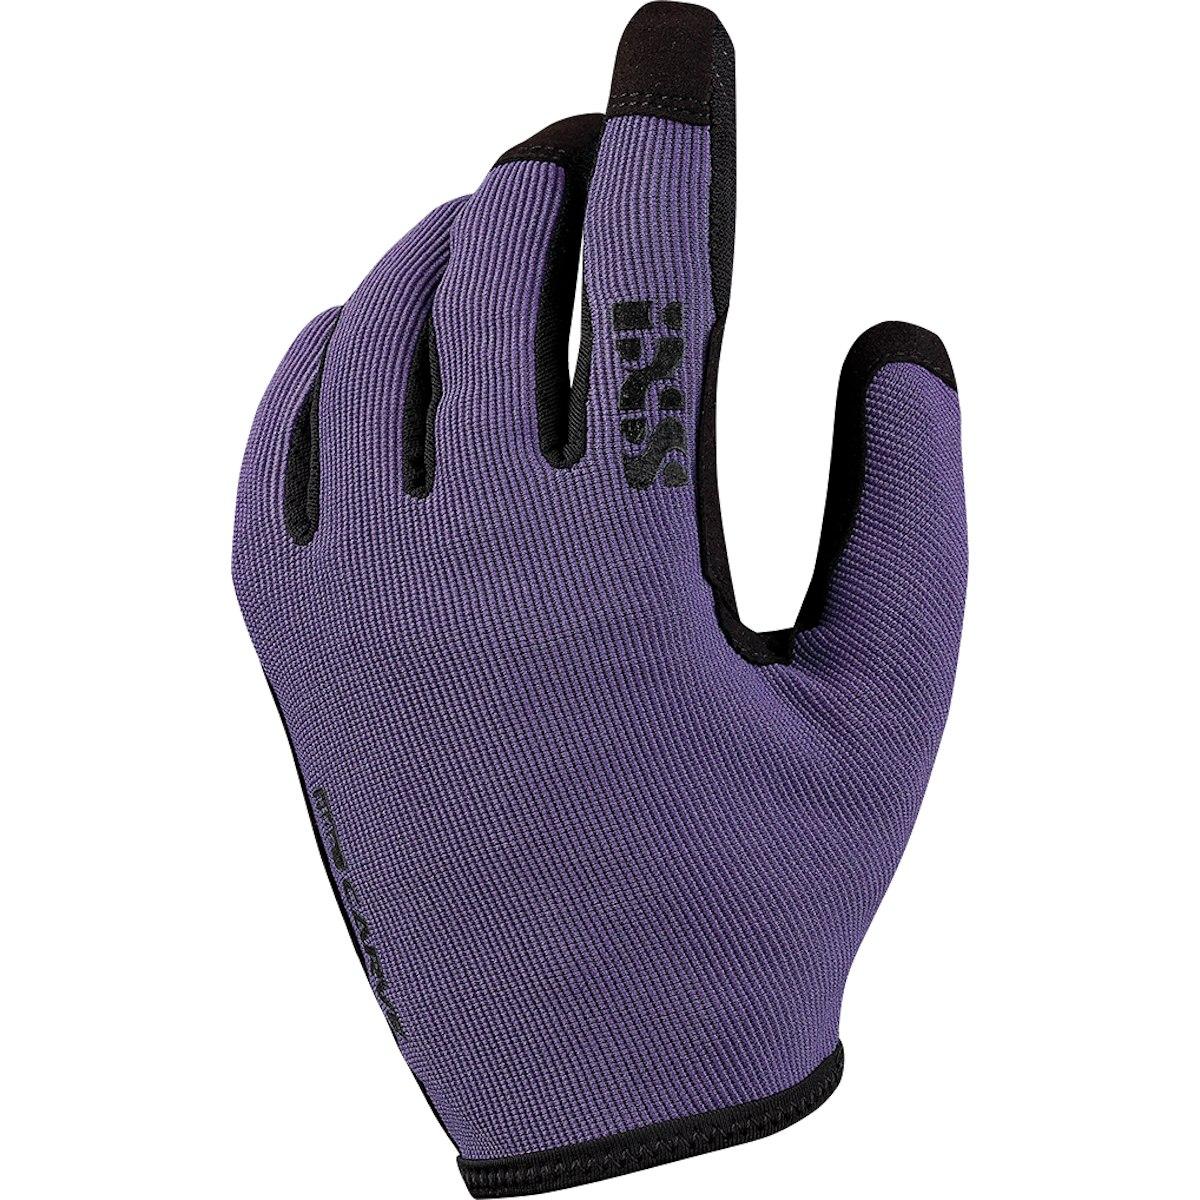 iXS Carve Damen Vollfinger-Handschuhe - grape